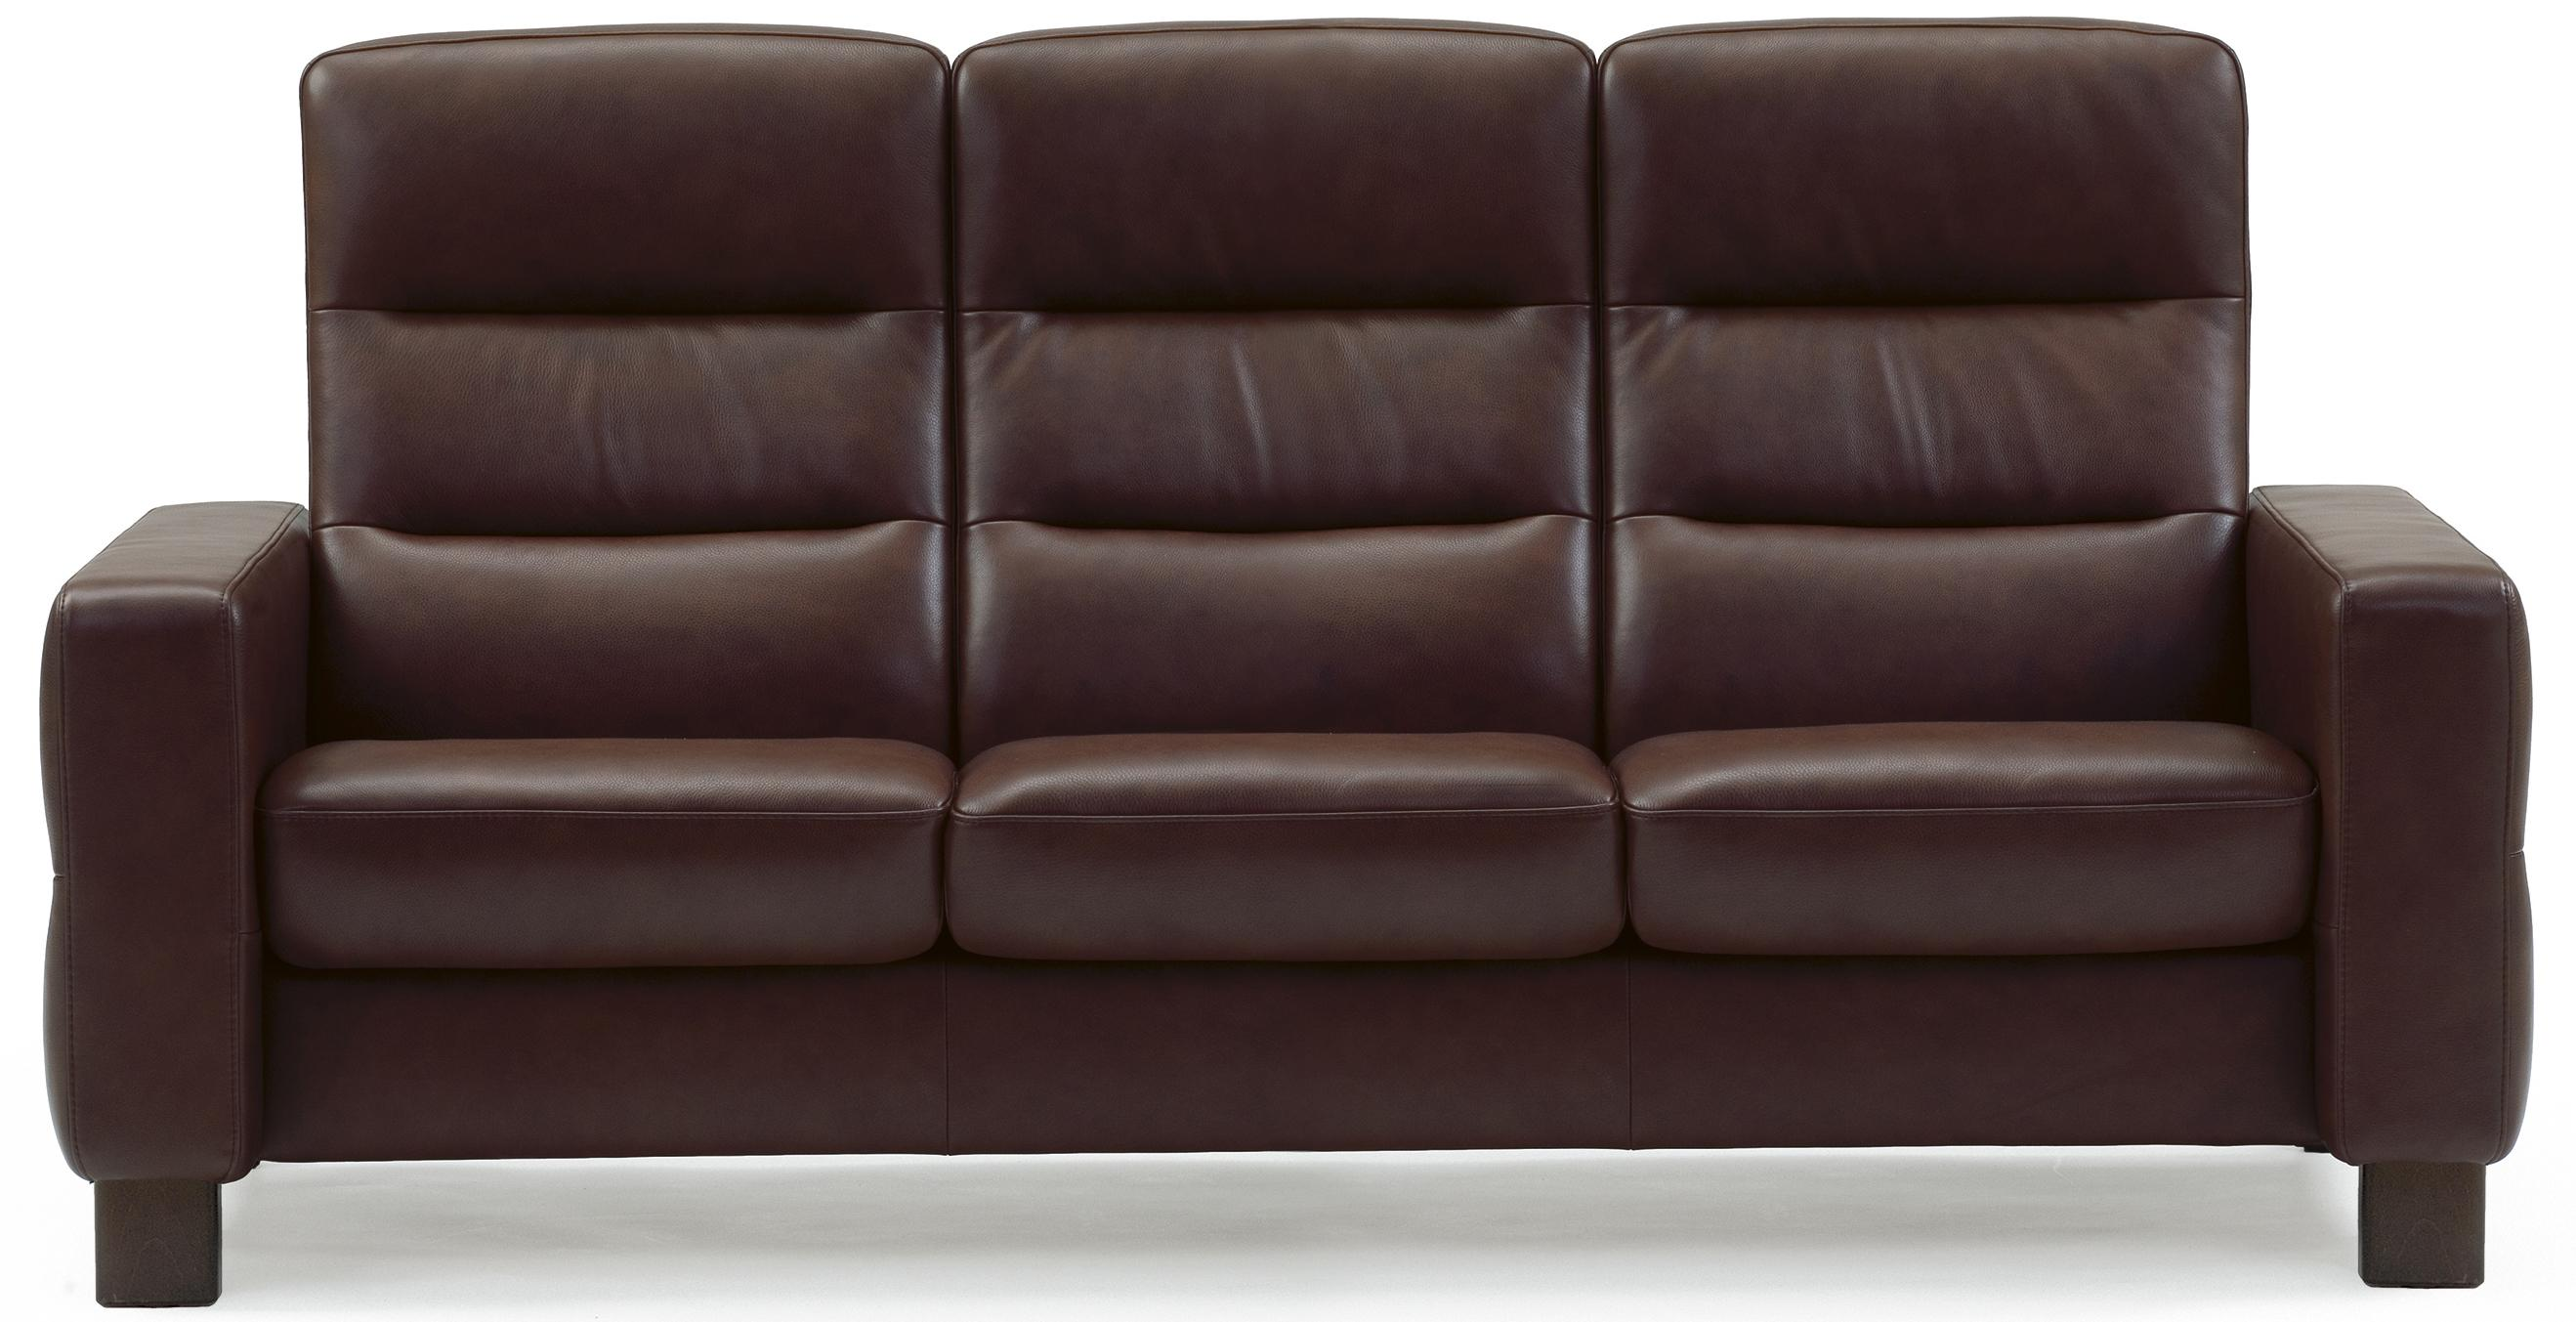 stressless wave high back reclining sofa rotmans reclining sofas. Black Bedroom Furniture Sets. Home Design Ideas